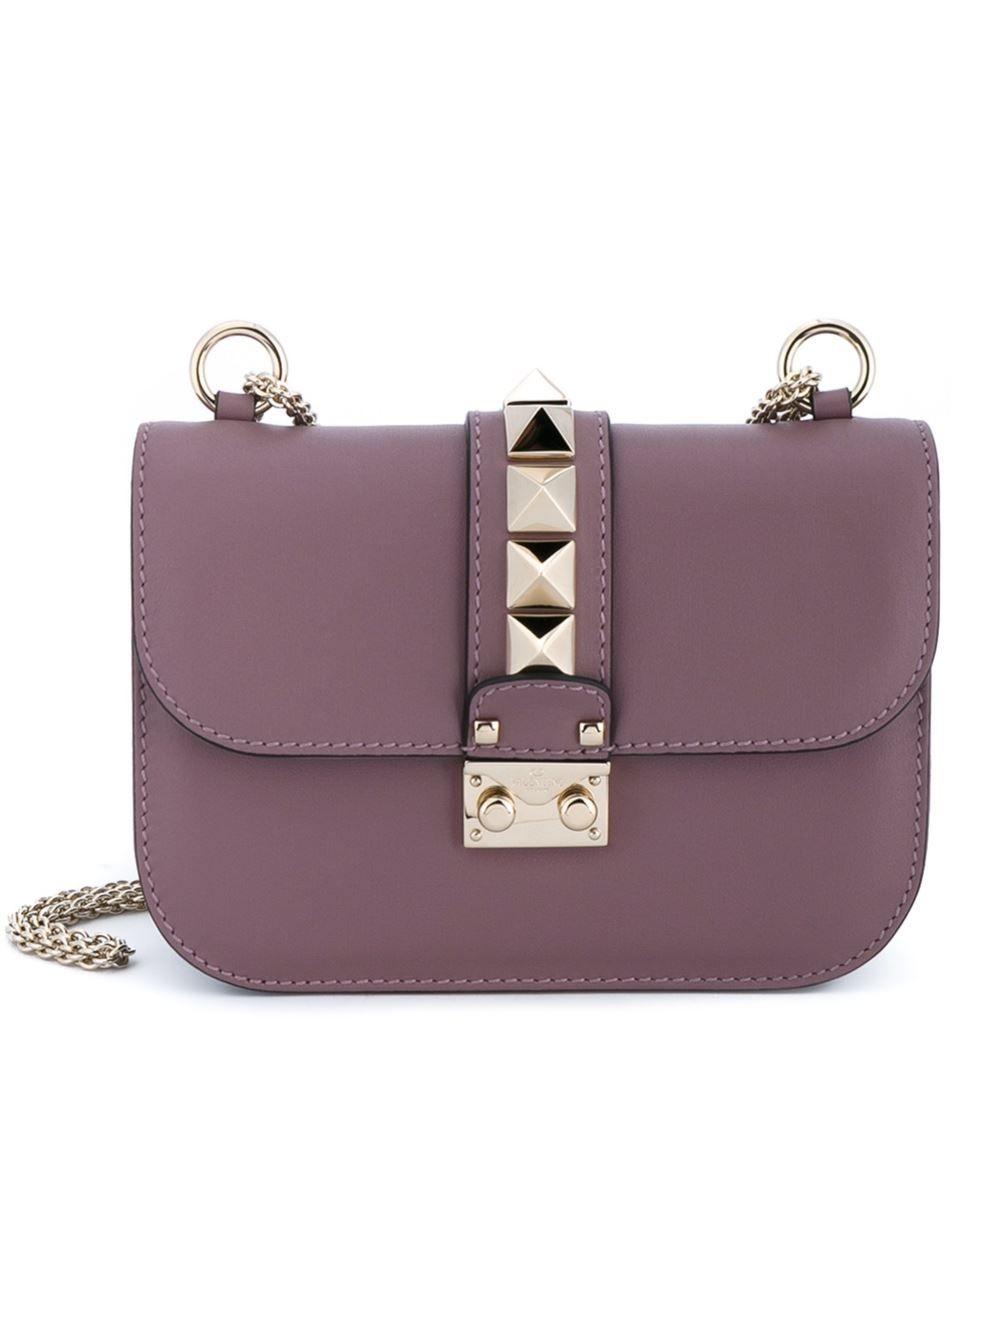 61269040592 Valentino Bolsa modelo 'Glam Lock' #bags #michaelkors #belize #bagsmk